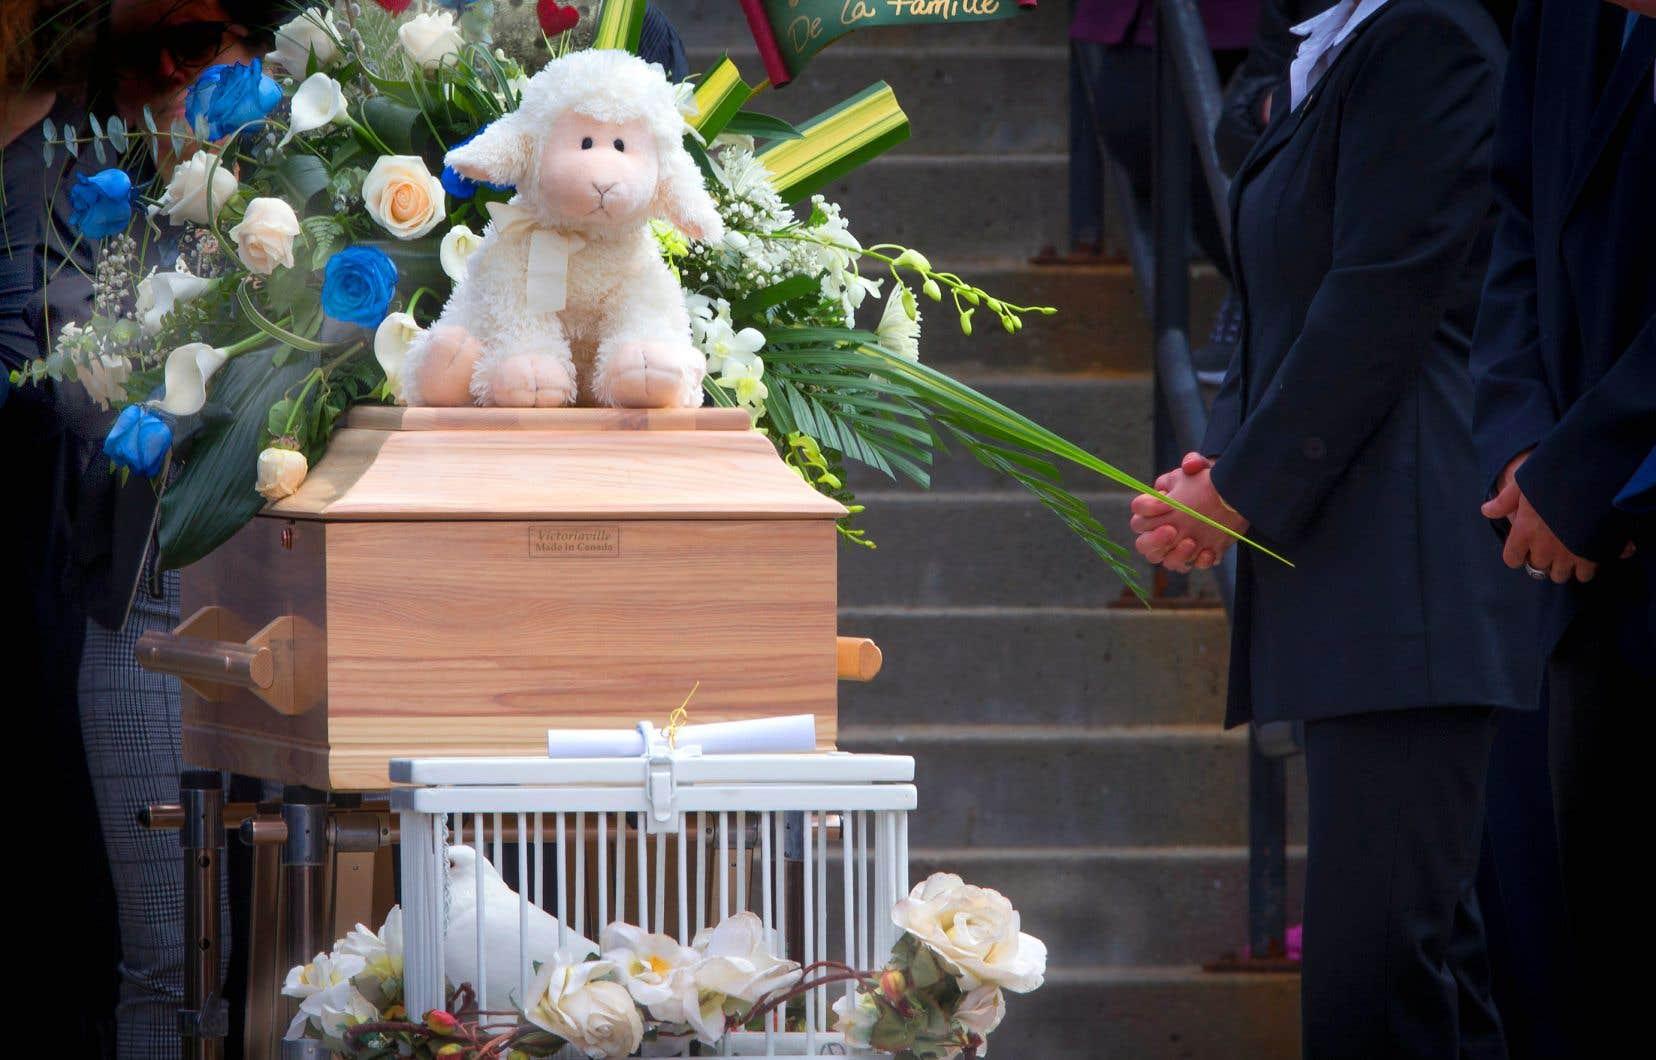 Les funérailles de la fillette de Granby ont eu lieu jeudi.